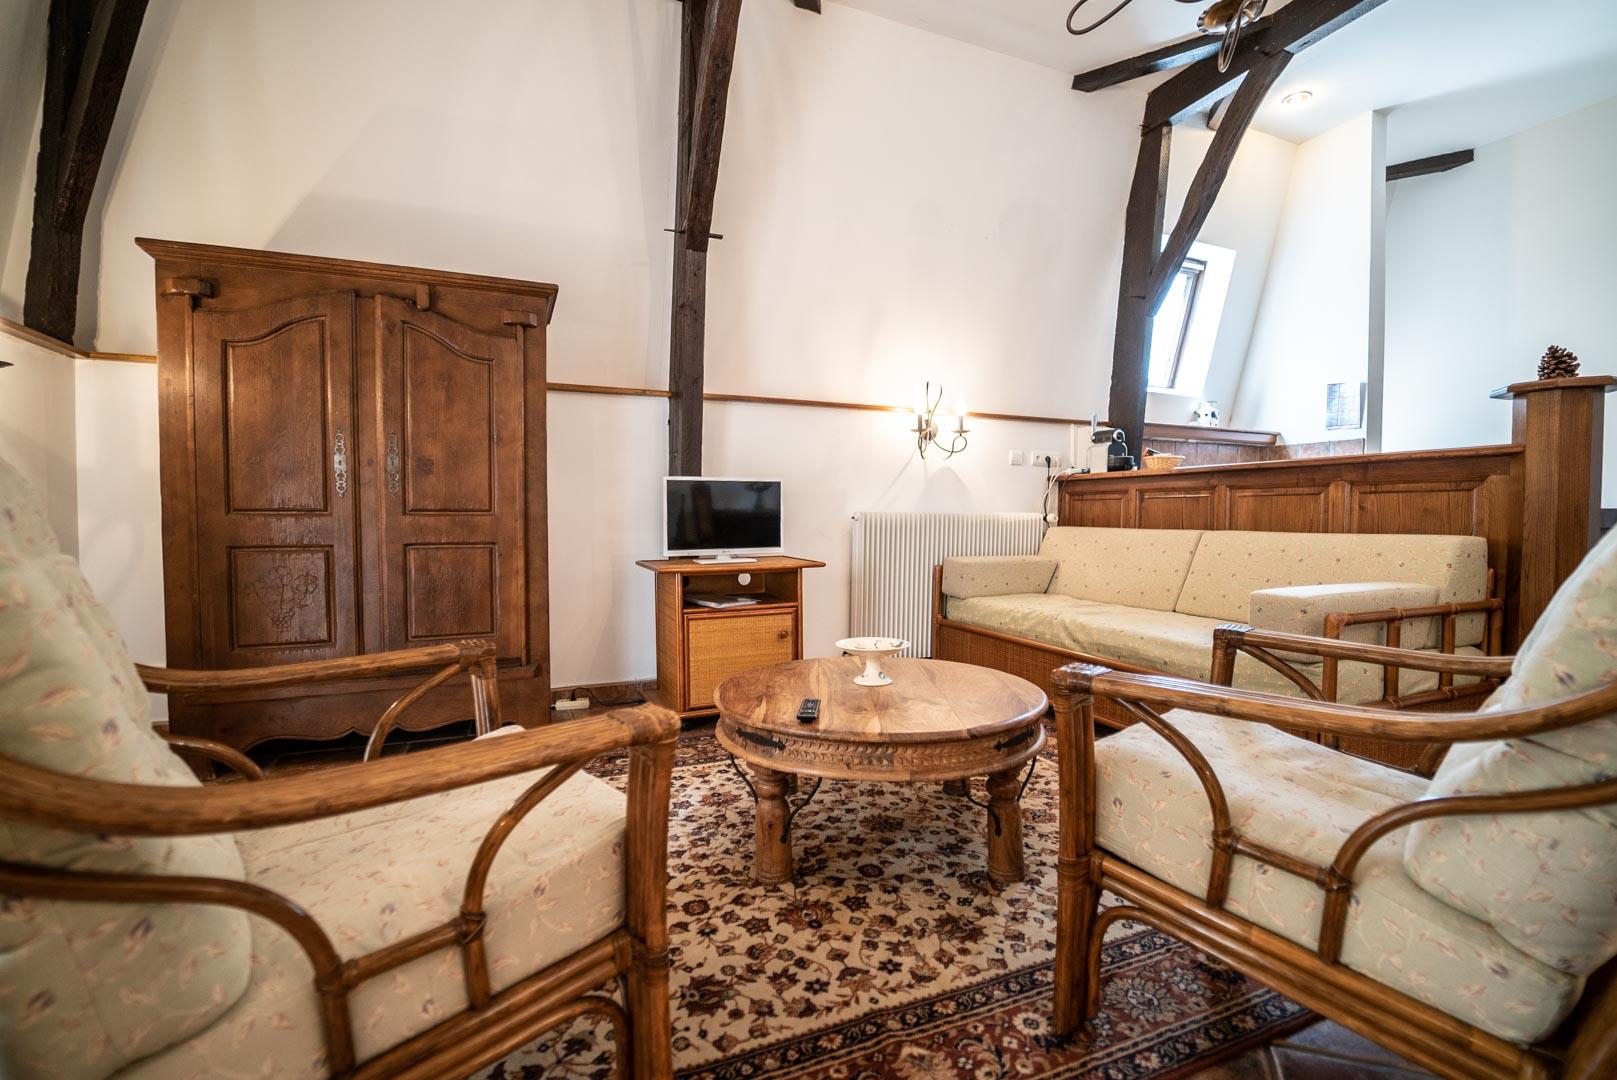 Suite monbazillac Chateau Rauly location bergerac Monbazillac